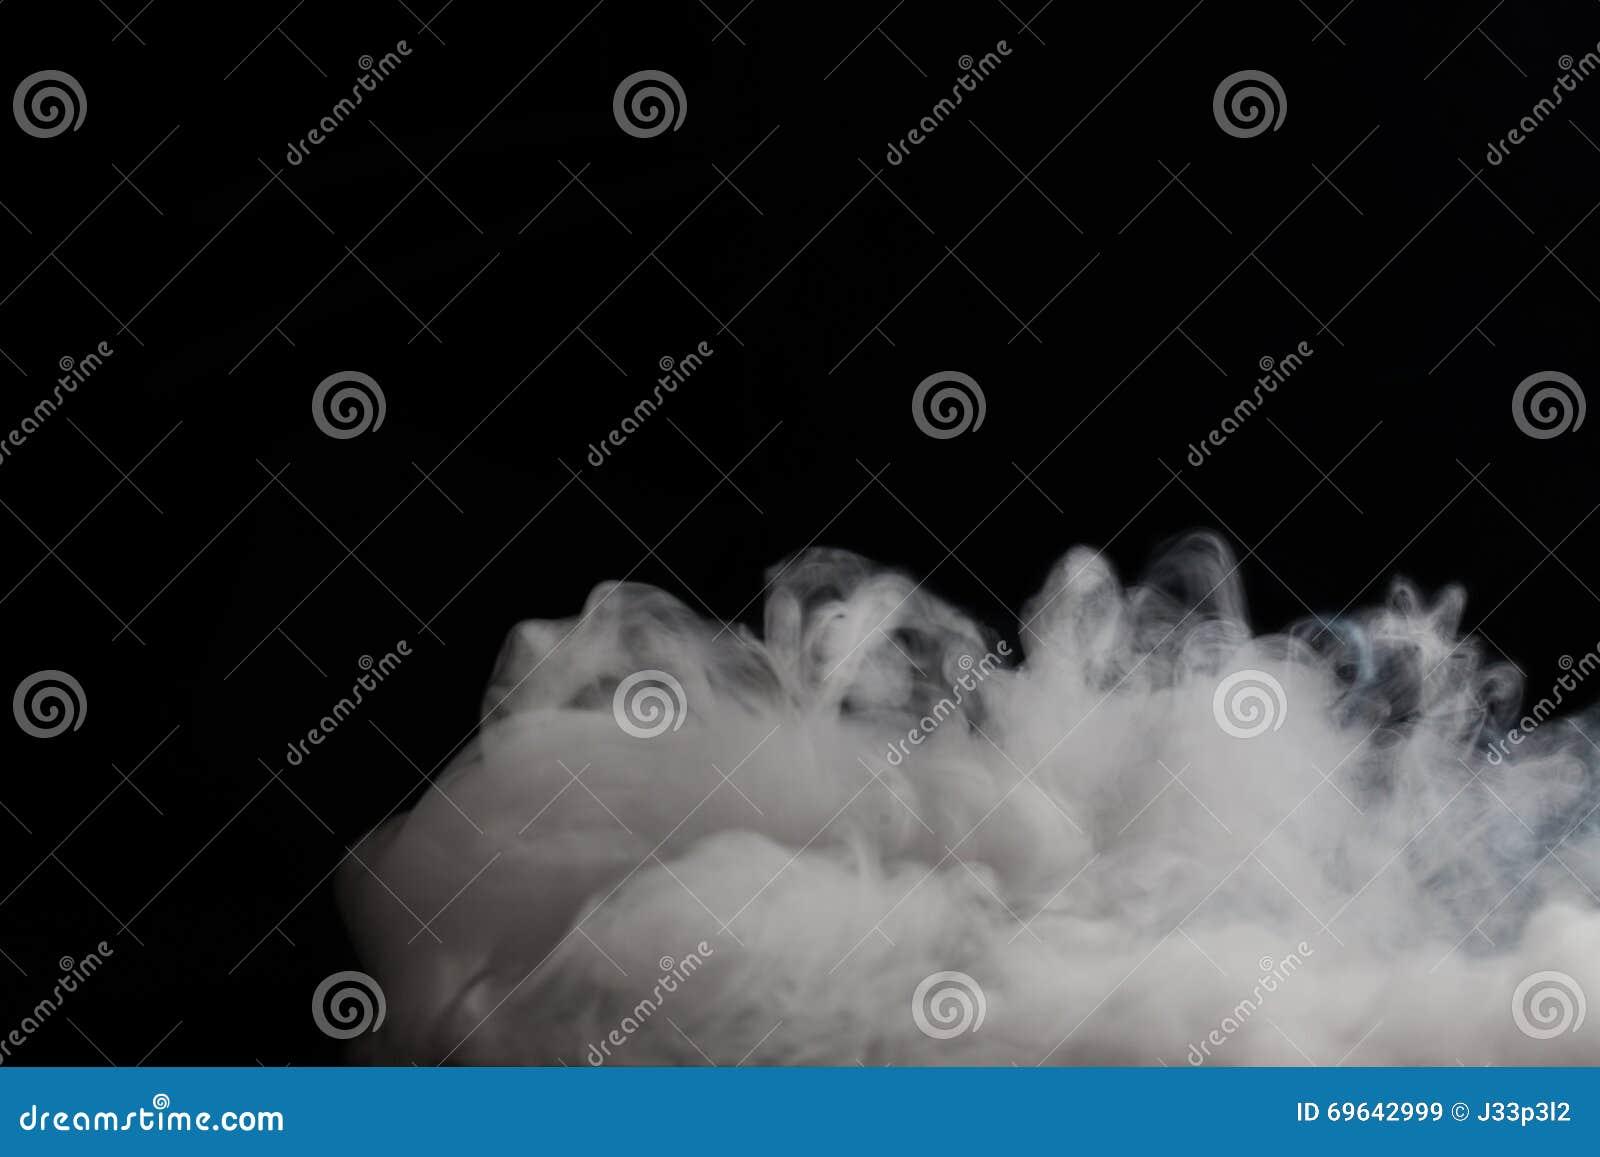 Слойки дыма